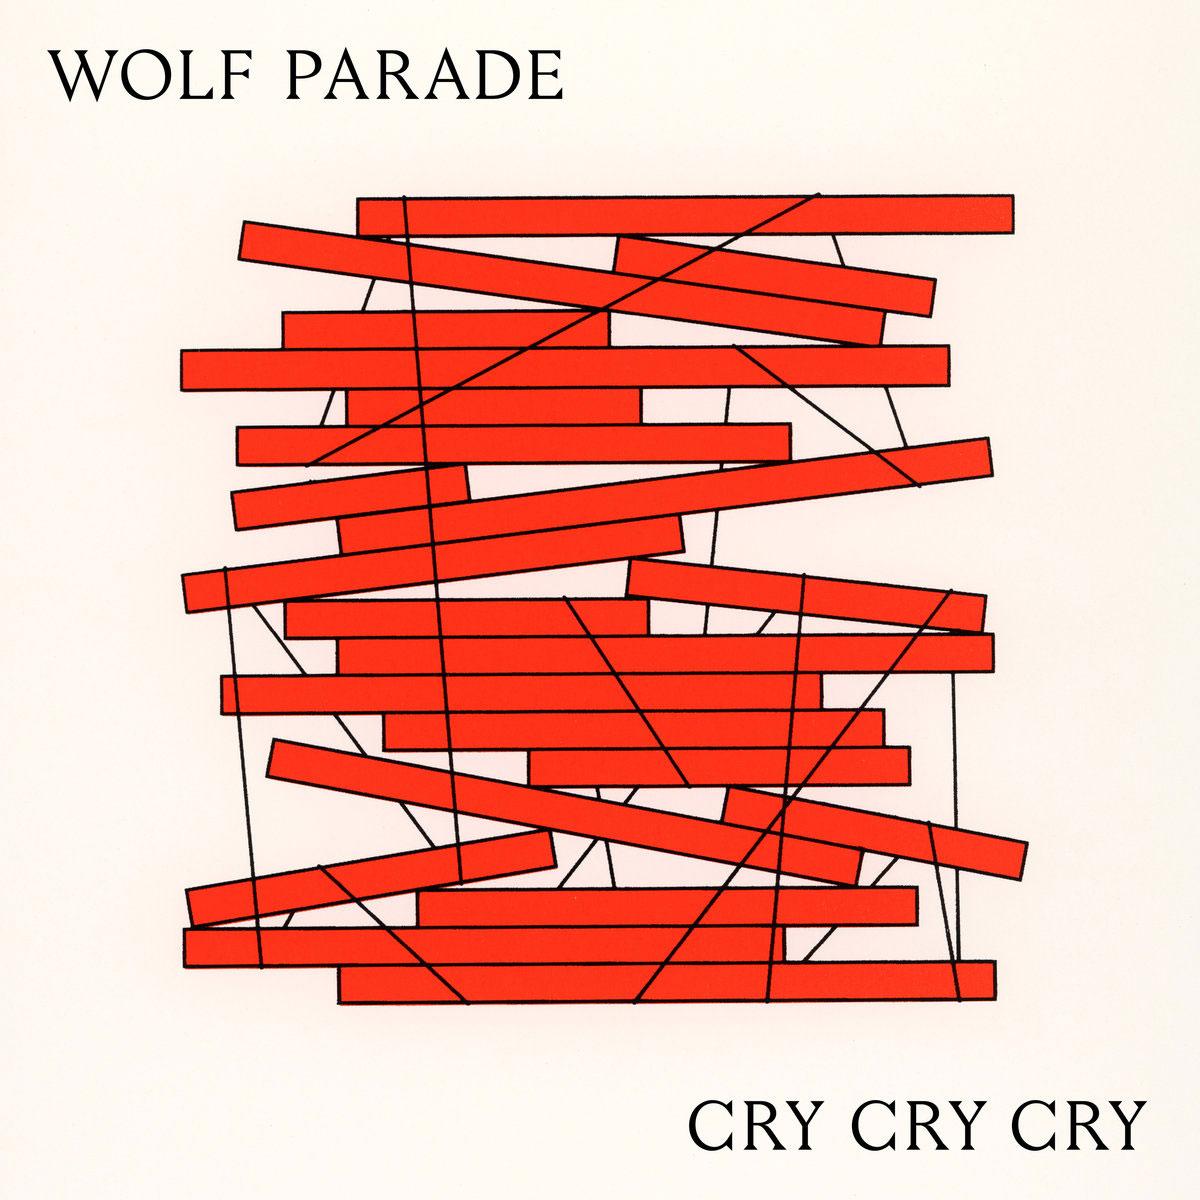 Cry Cry Cry